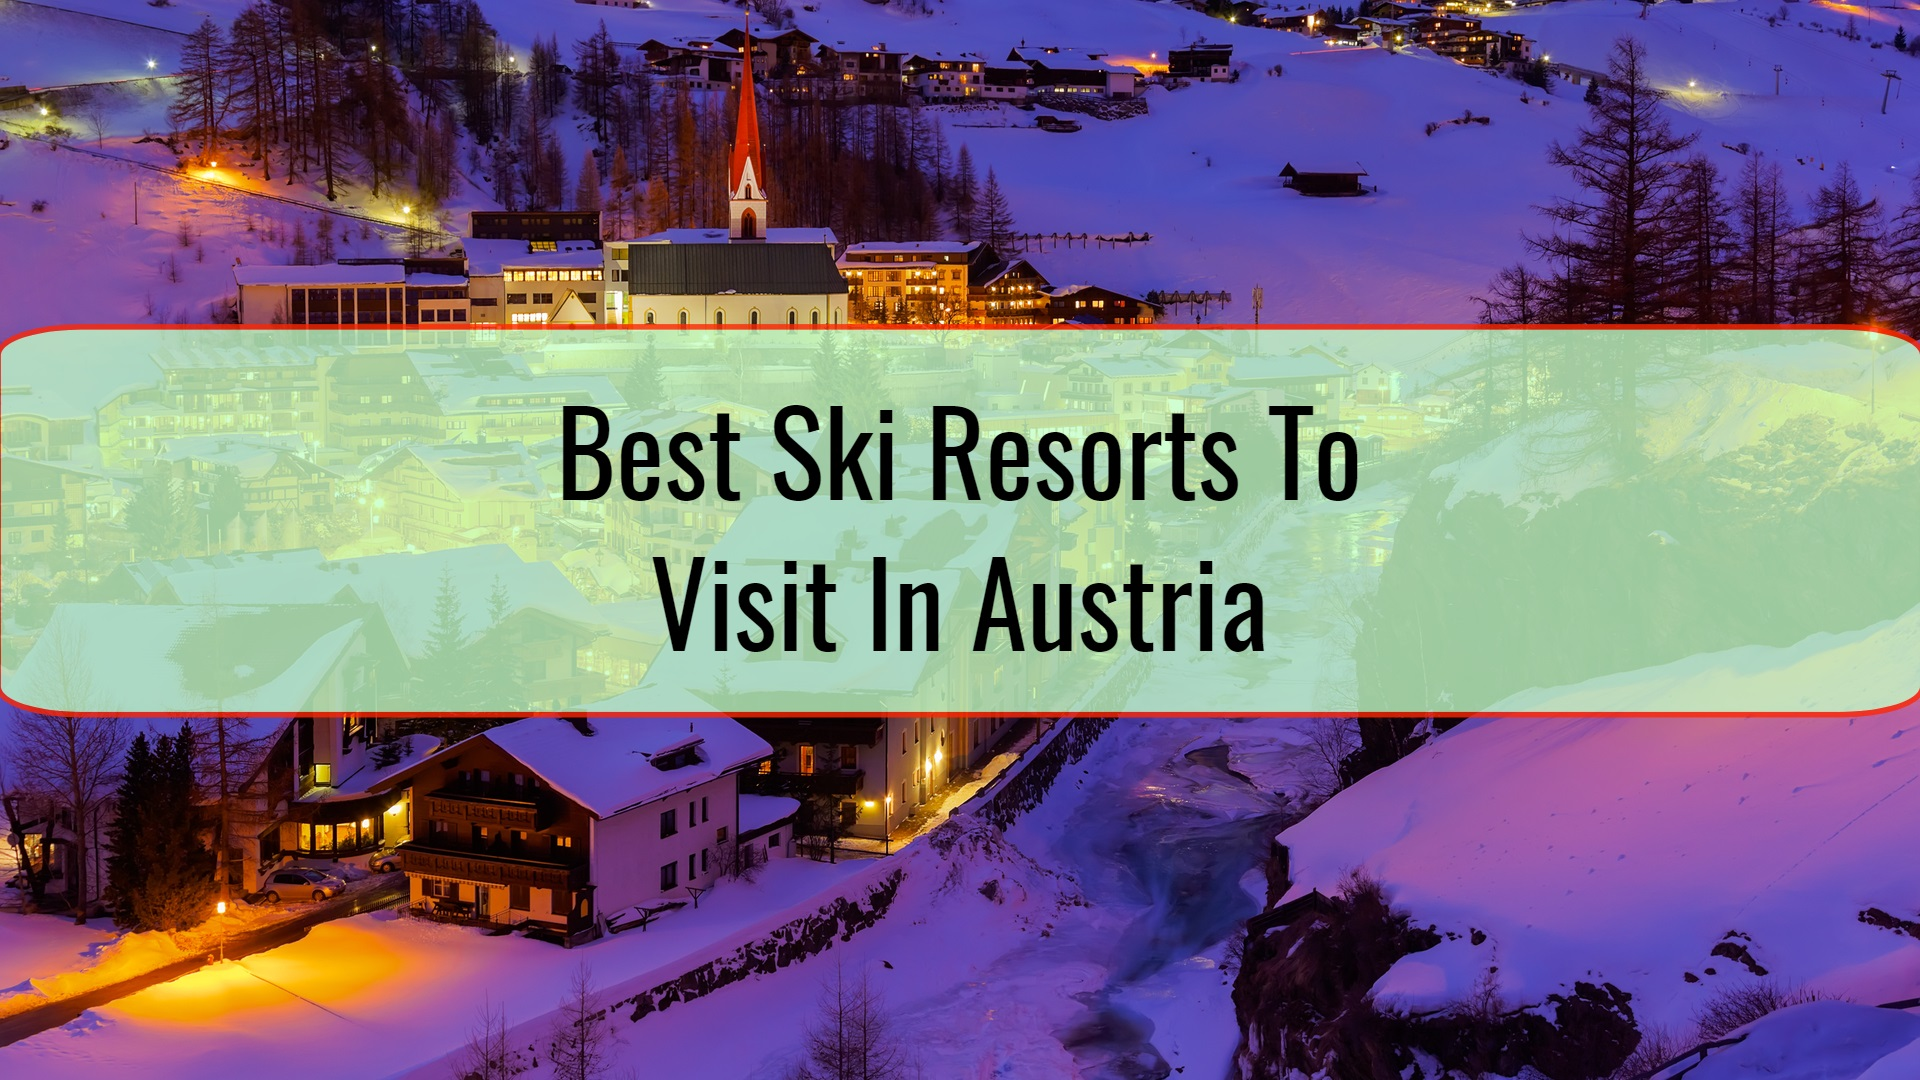 Best Ski Resorts To Visit In Austria